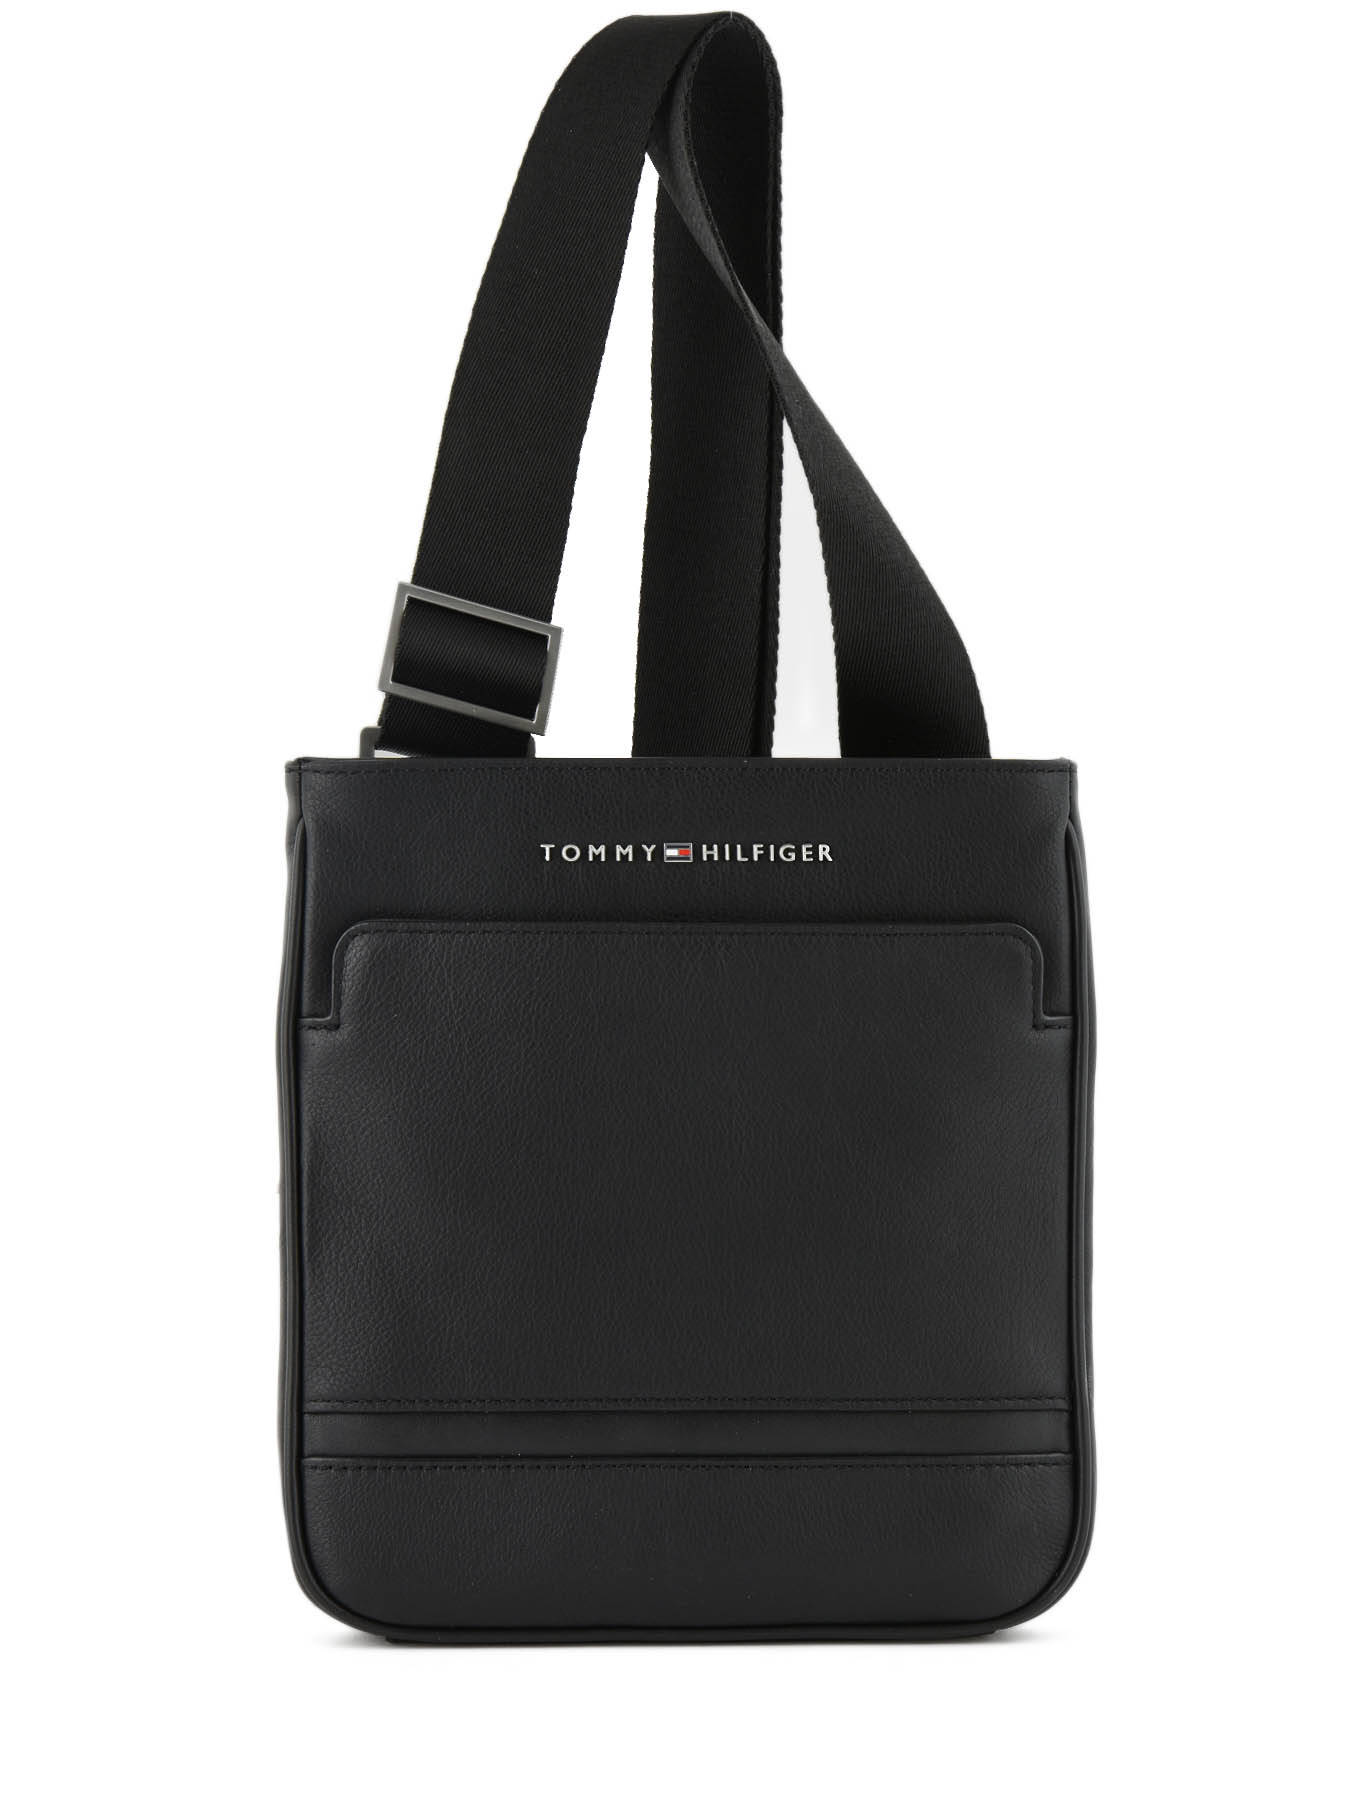 027ed82547ed ... Crossbody Bag Tommy hilfiger Black business AM04433 ...